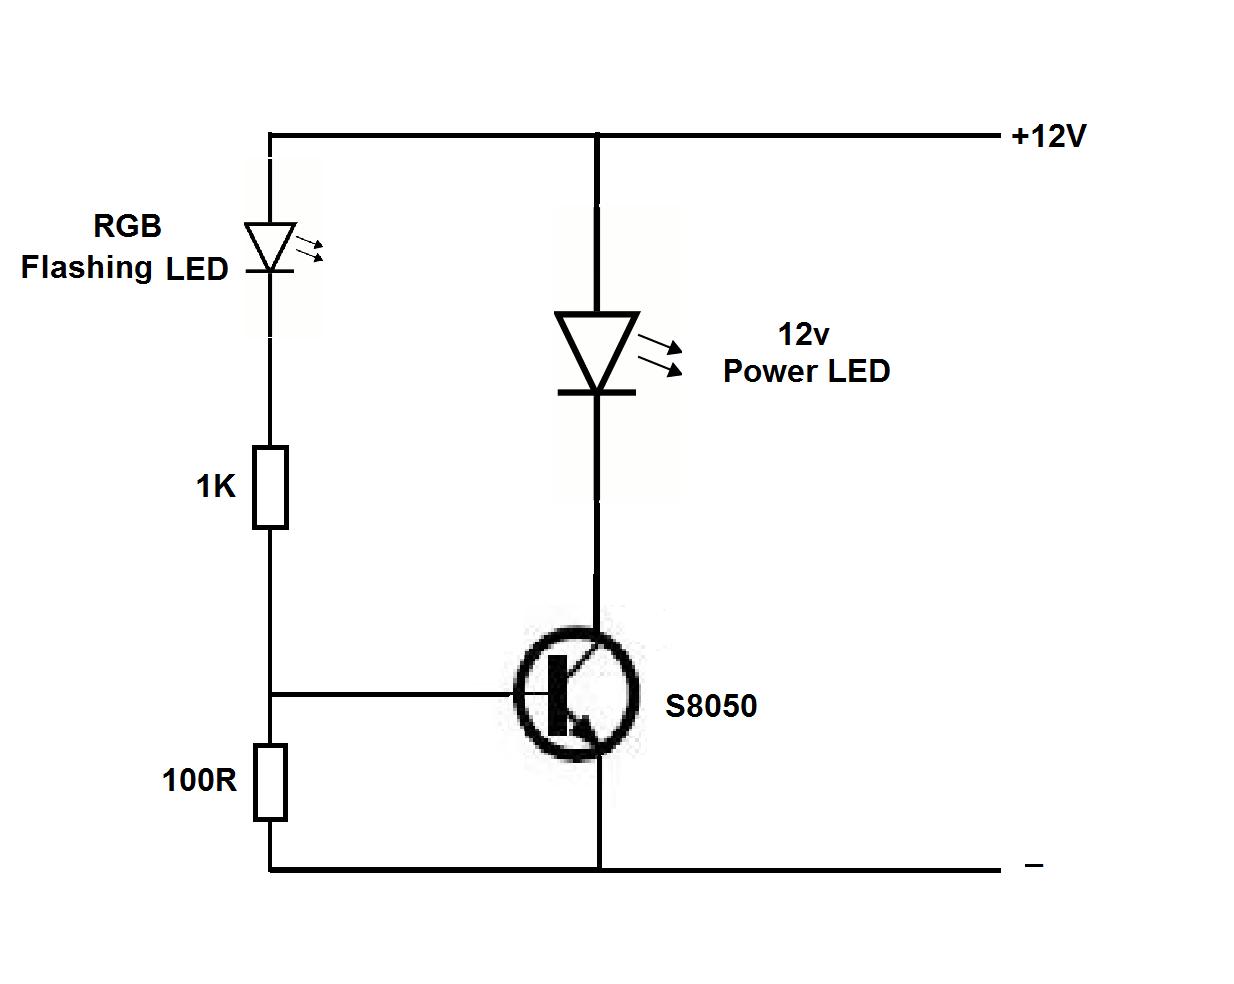 12v Led Wiring Diagram For Rgb - Wiring Diagrams Folder  Led Wiring Diagram on